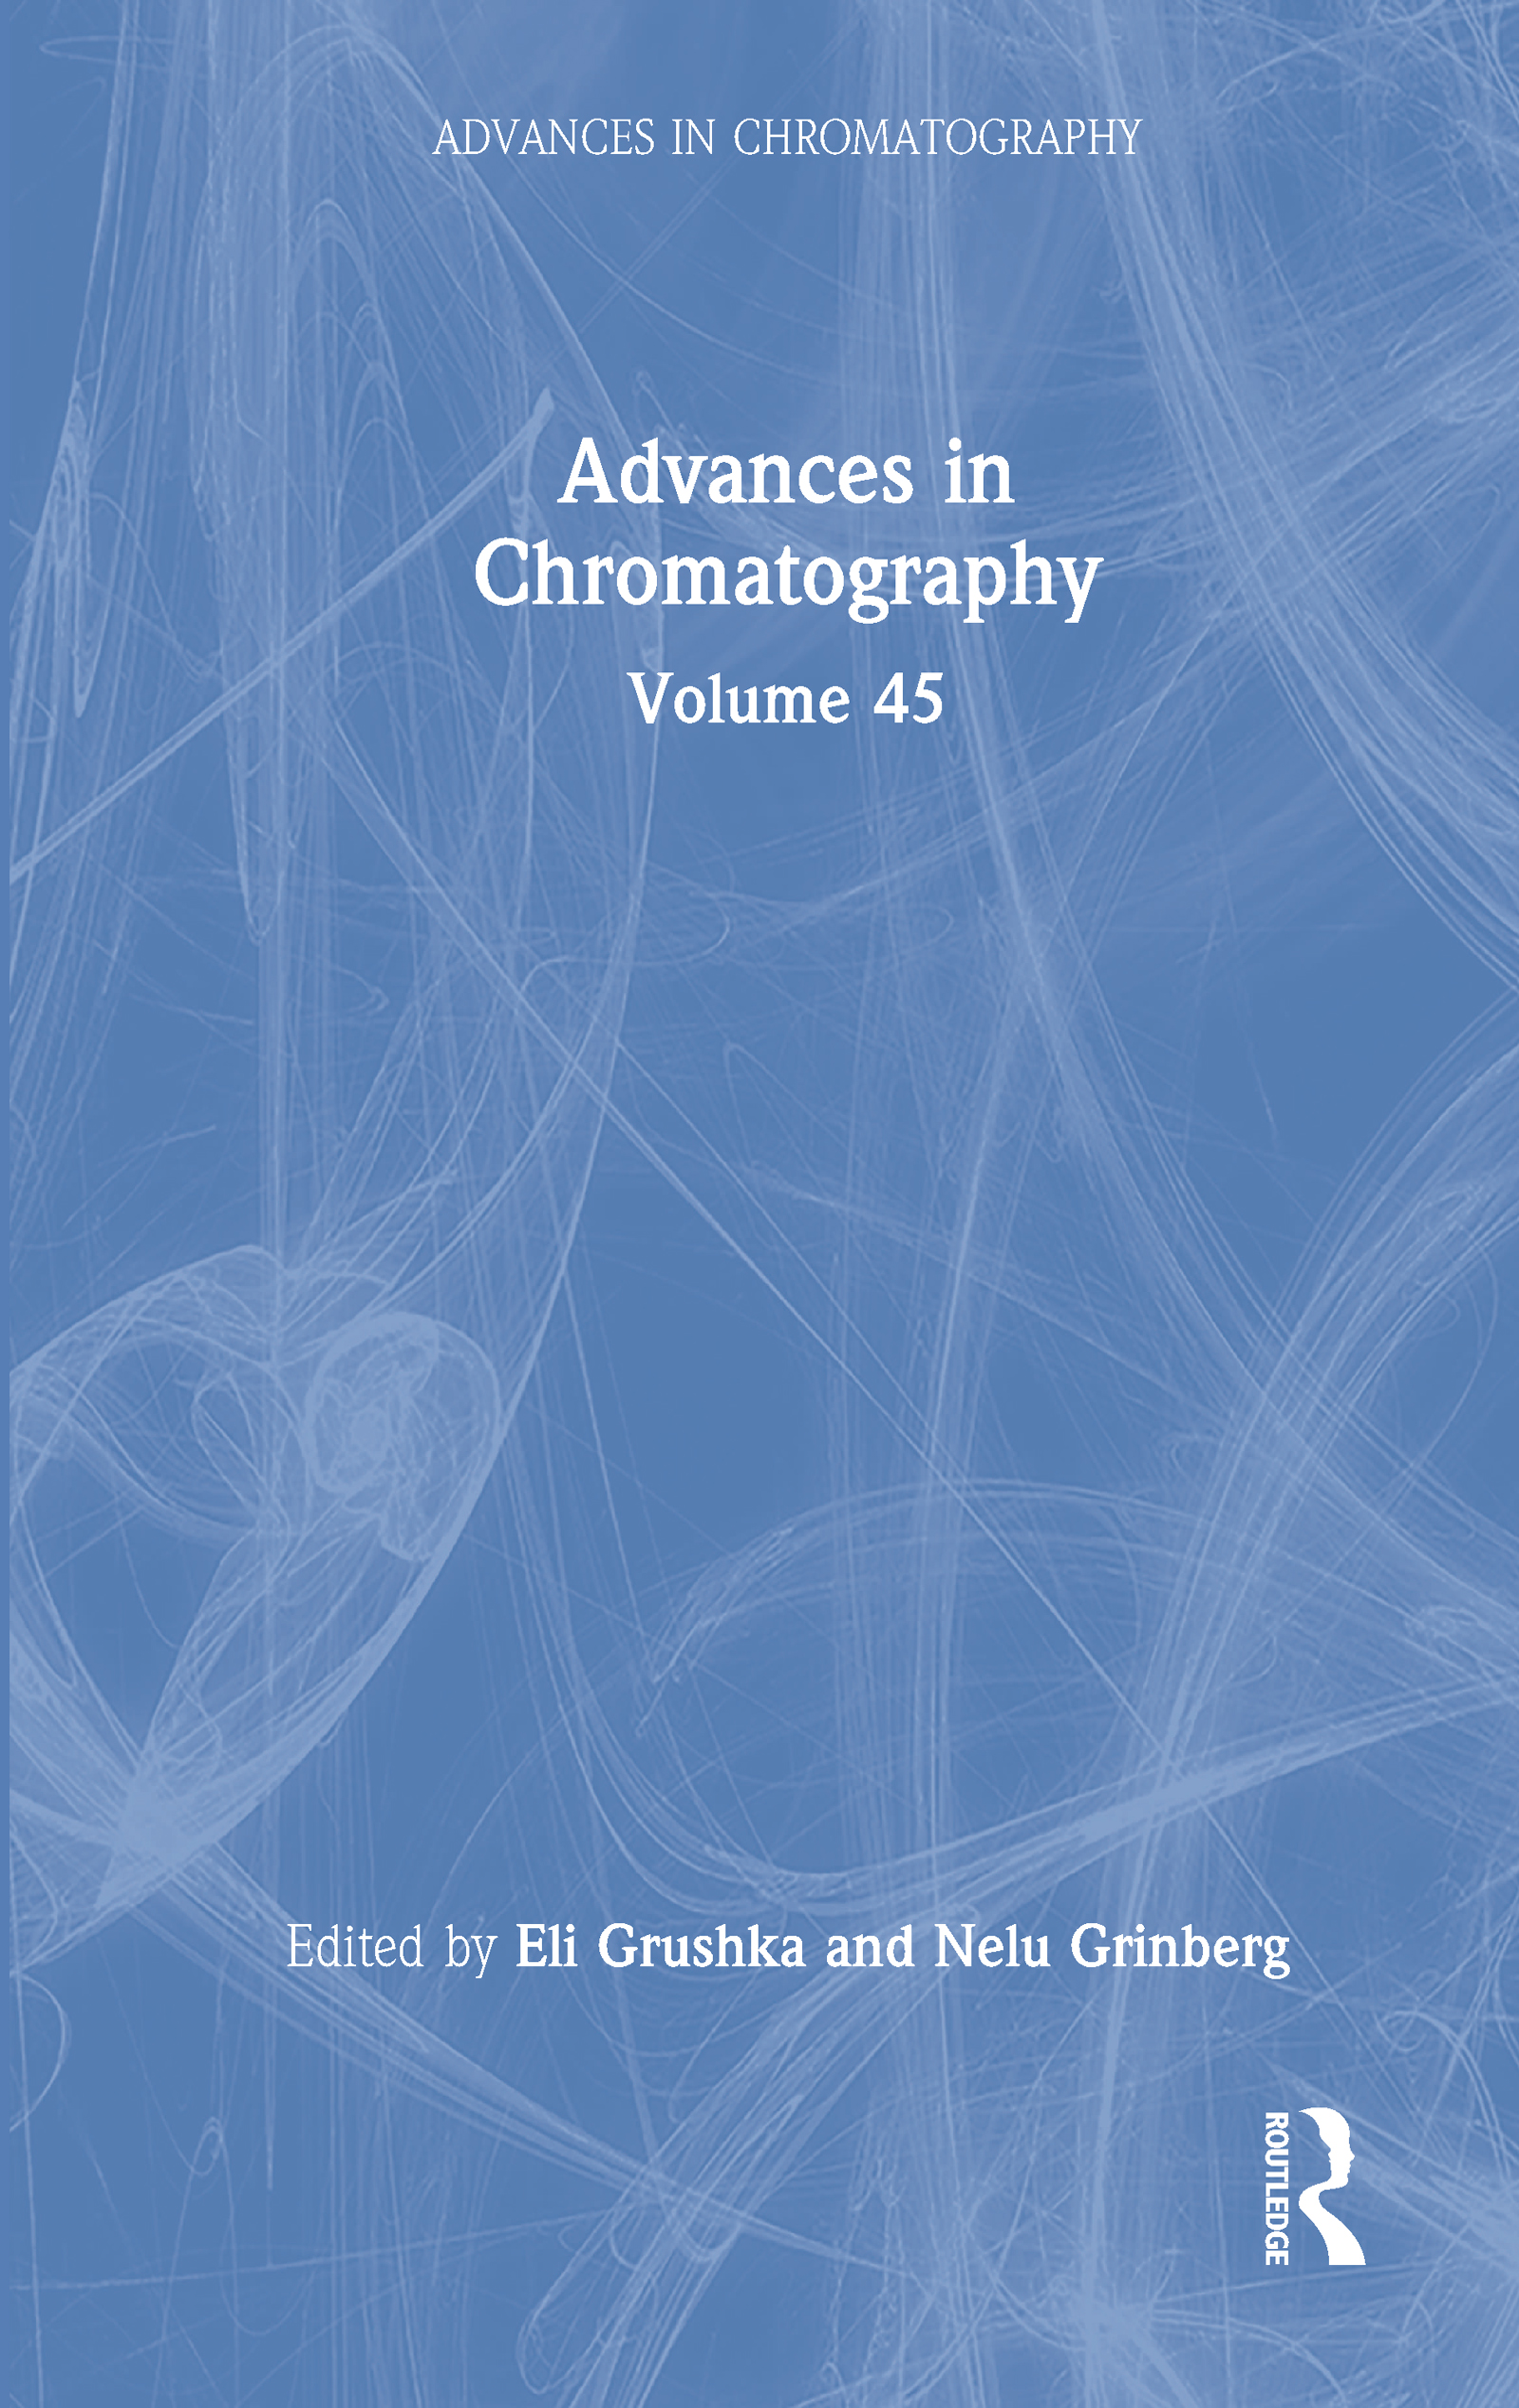 Advances in Chromatography: Volume 45 book cover